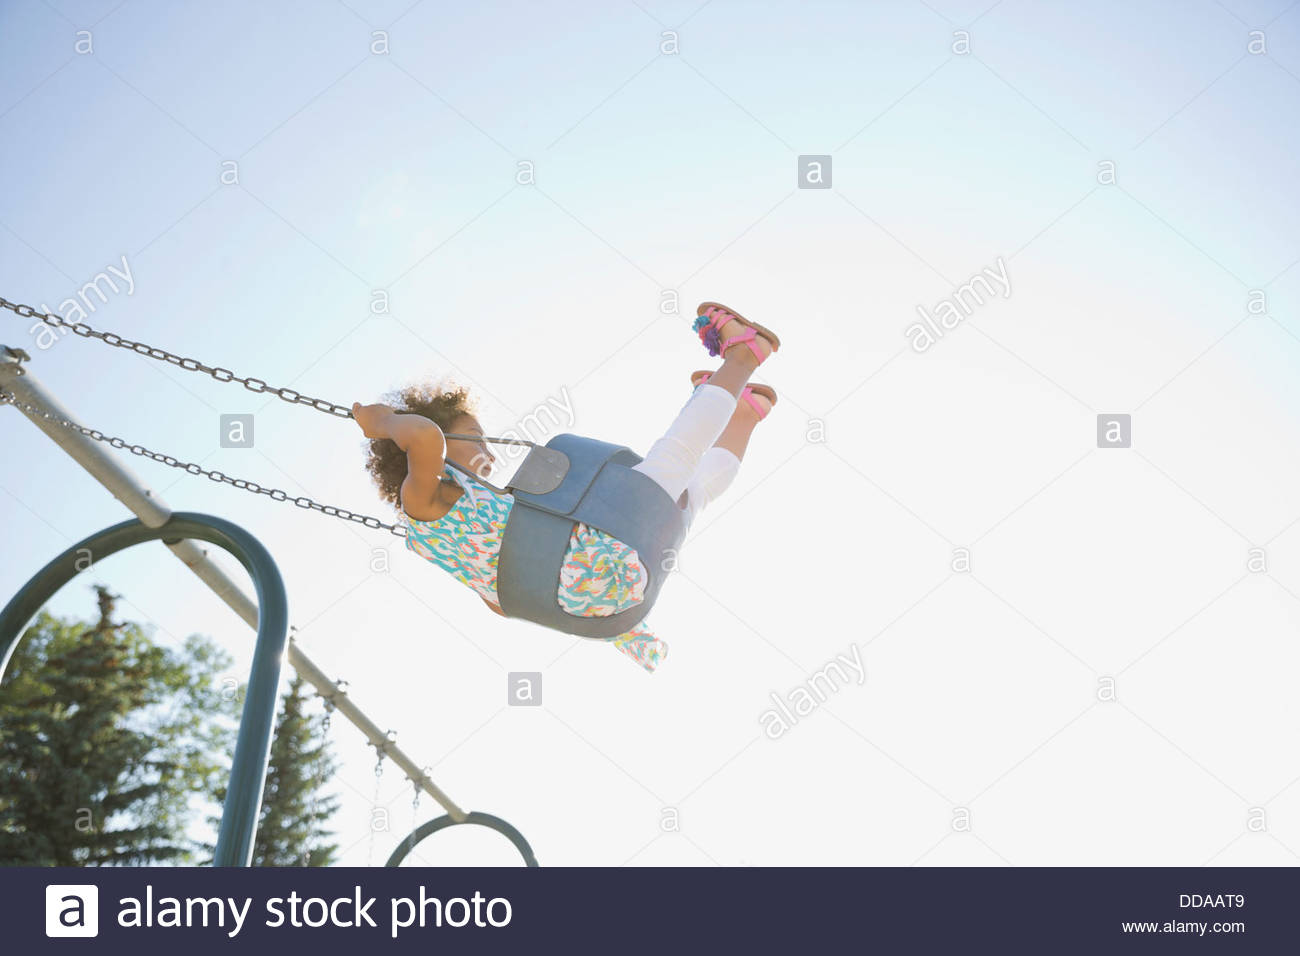 Little girl on swings - Stock Image